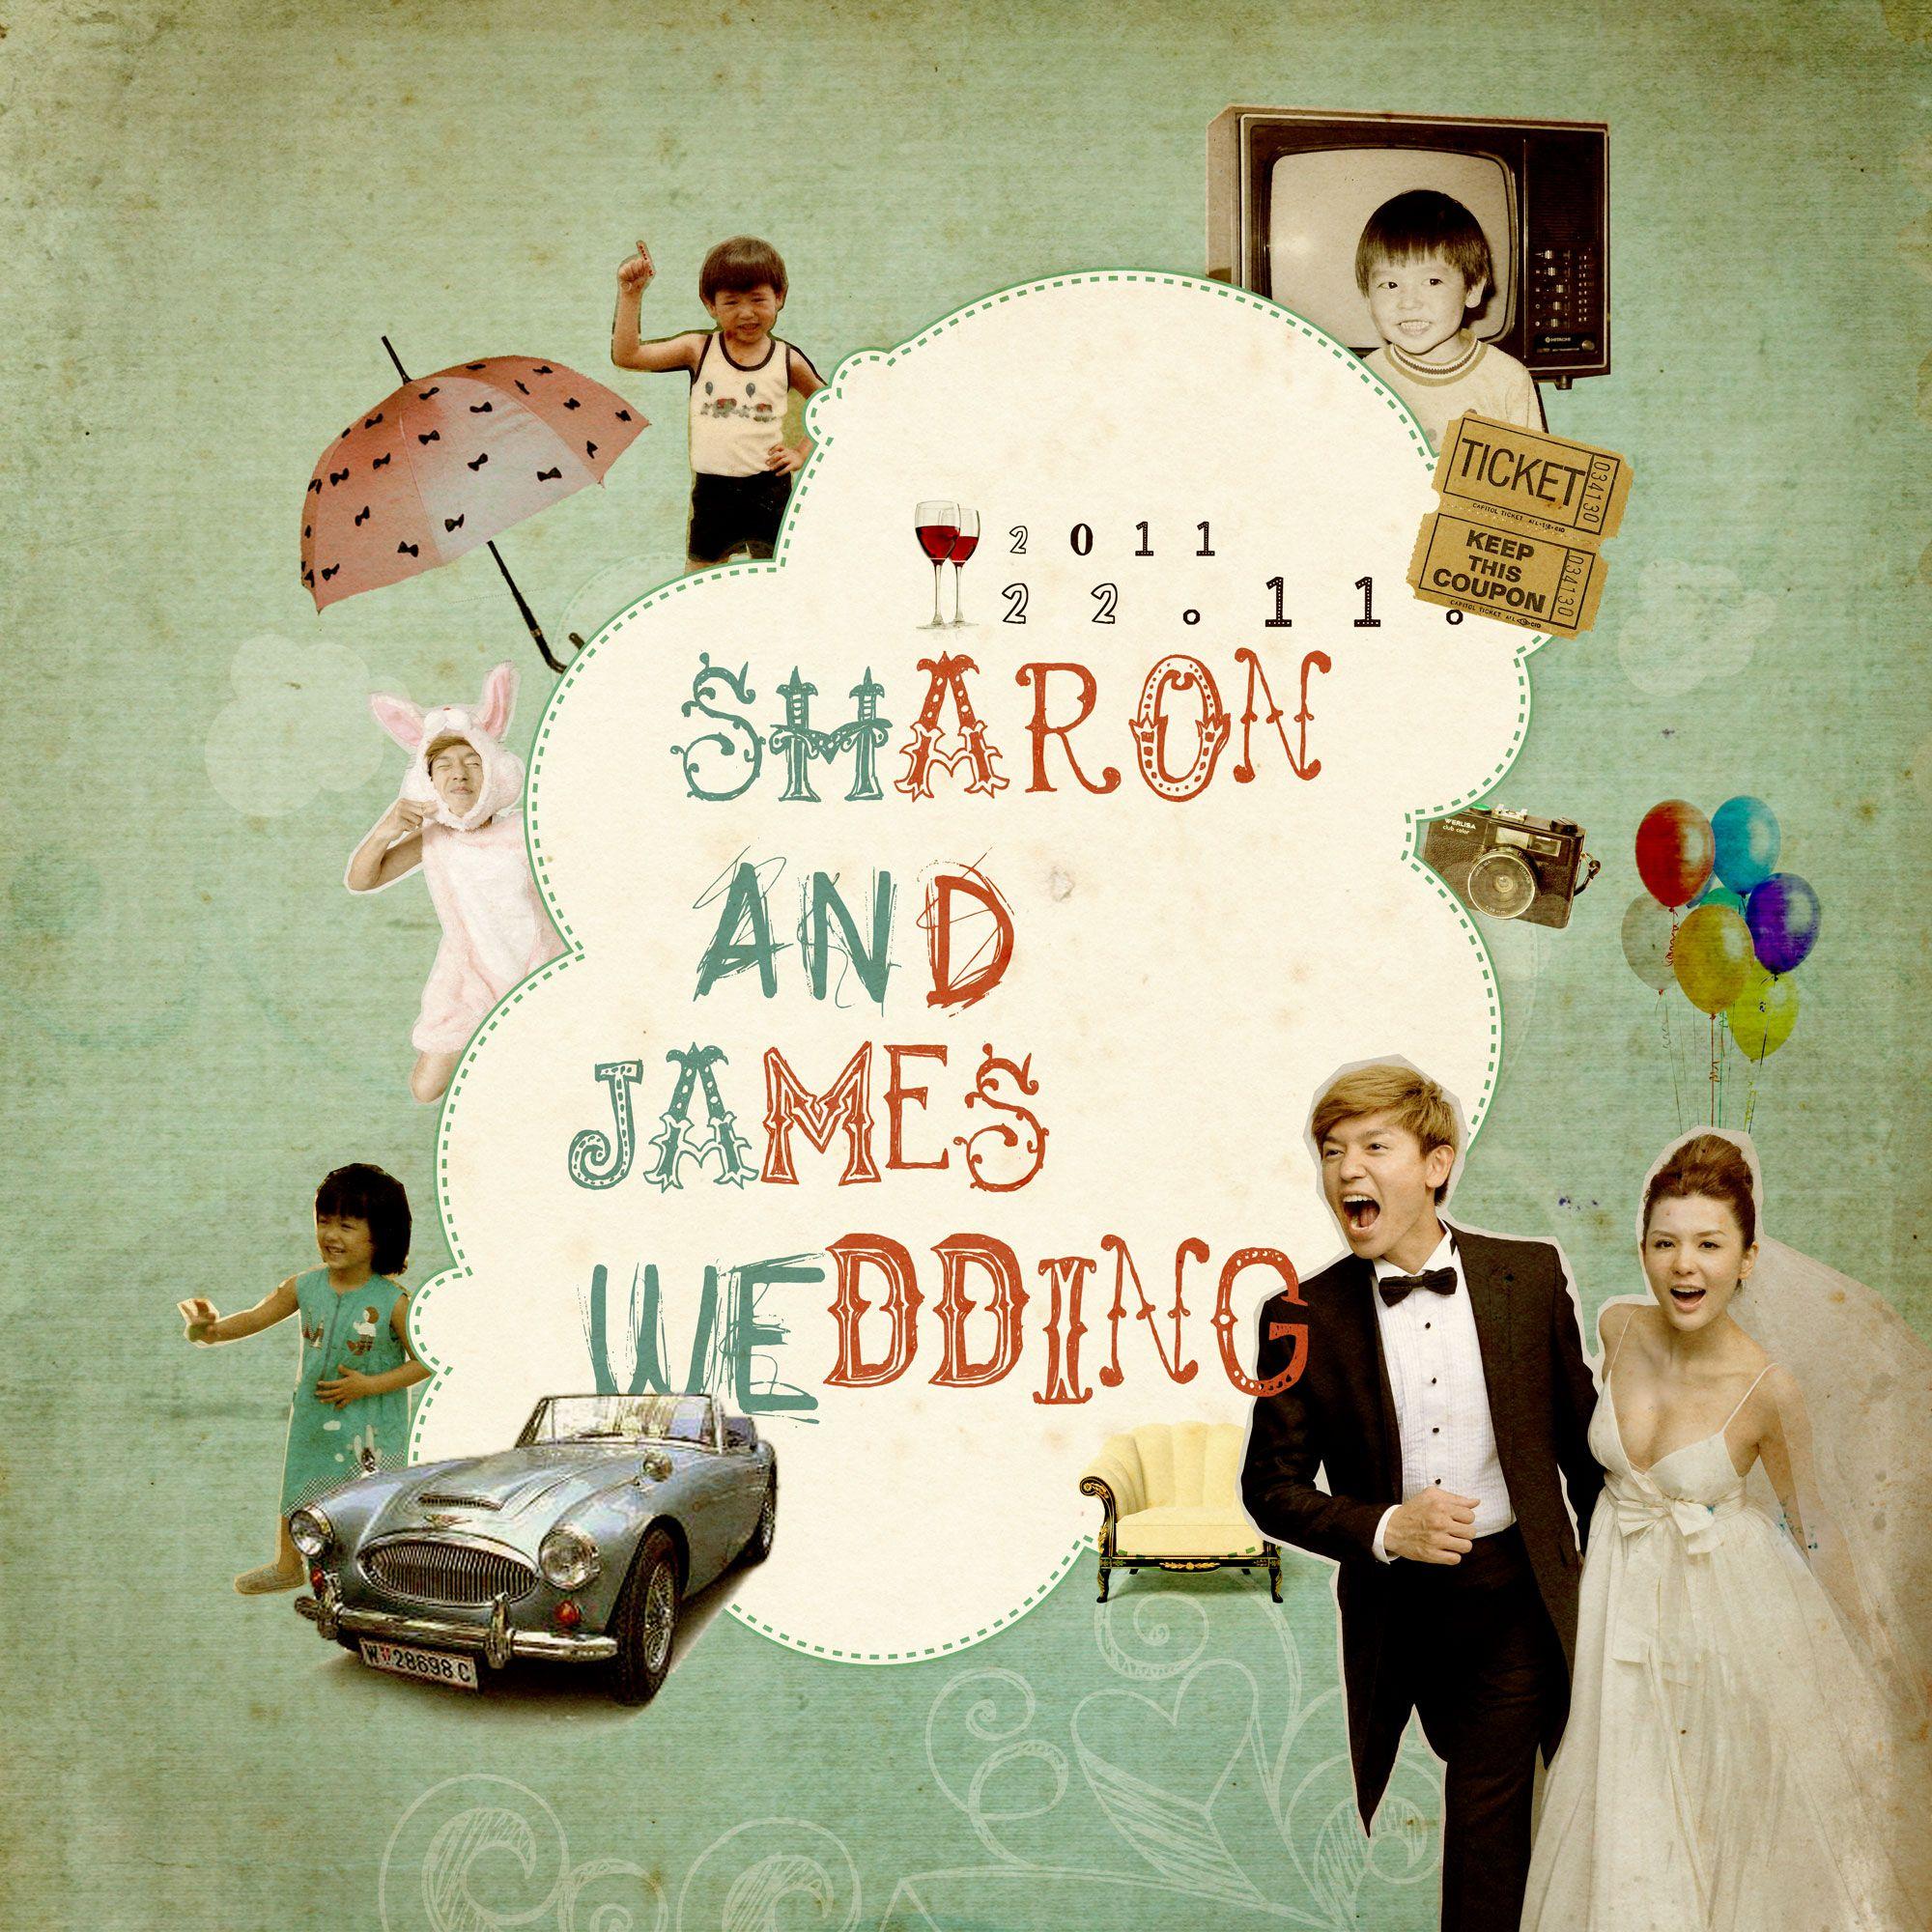 Pop Art Wedding | Wedding Ideas: Stationery | Pinterest | Wedding ...